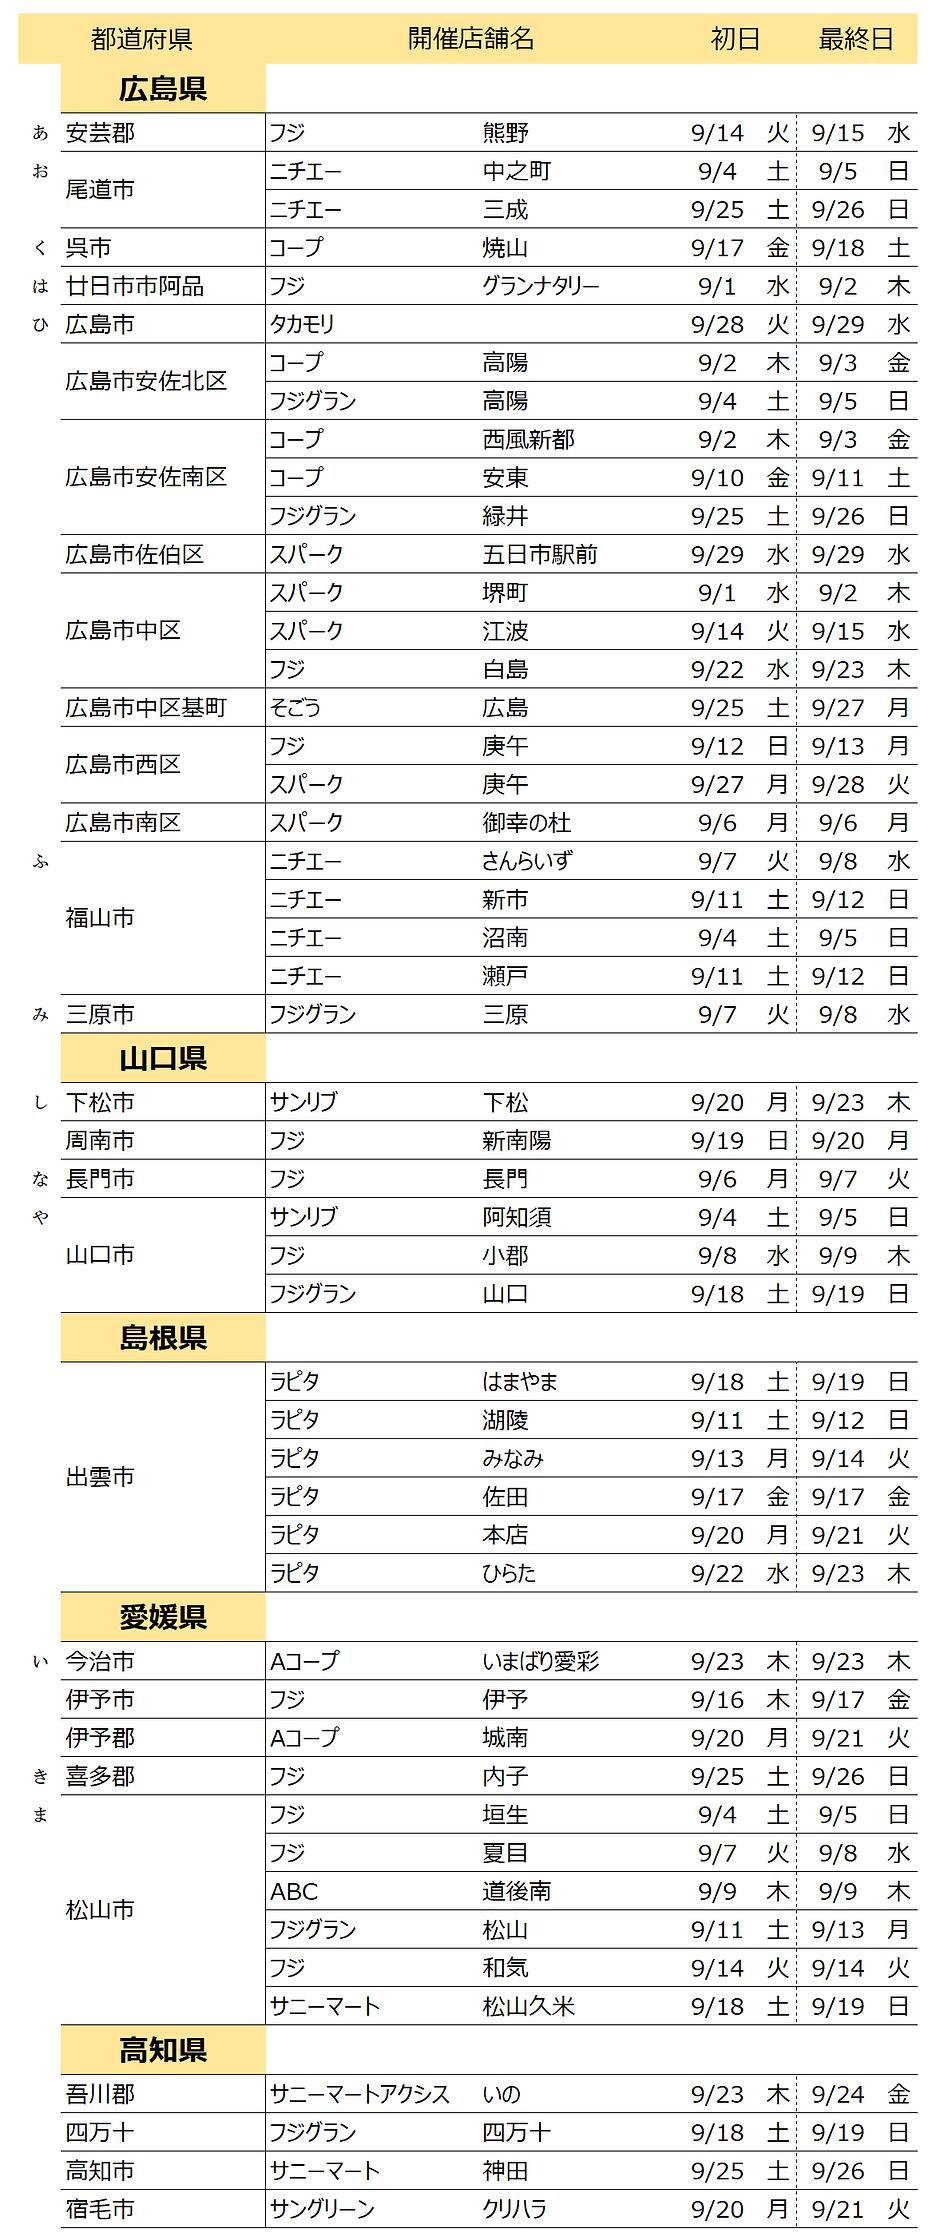 中四国21.9修正版ver2.png